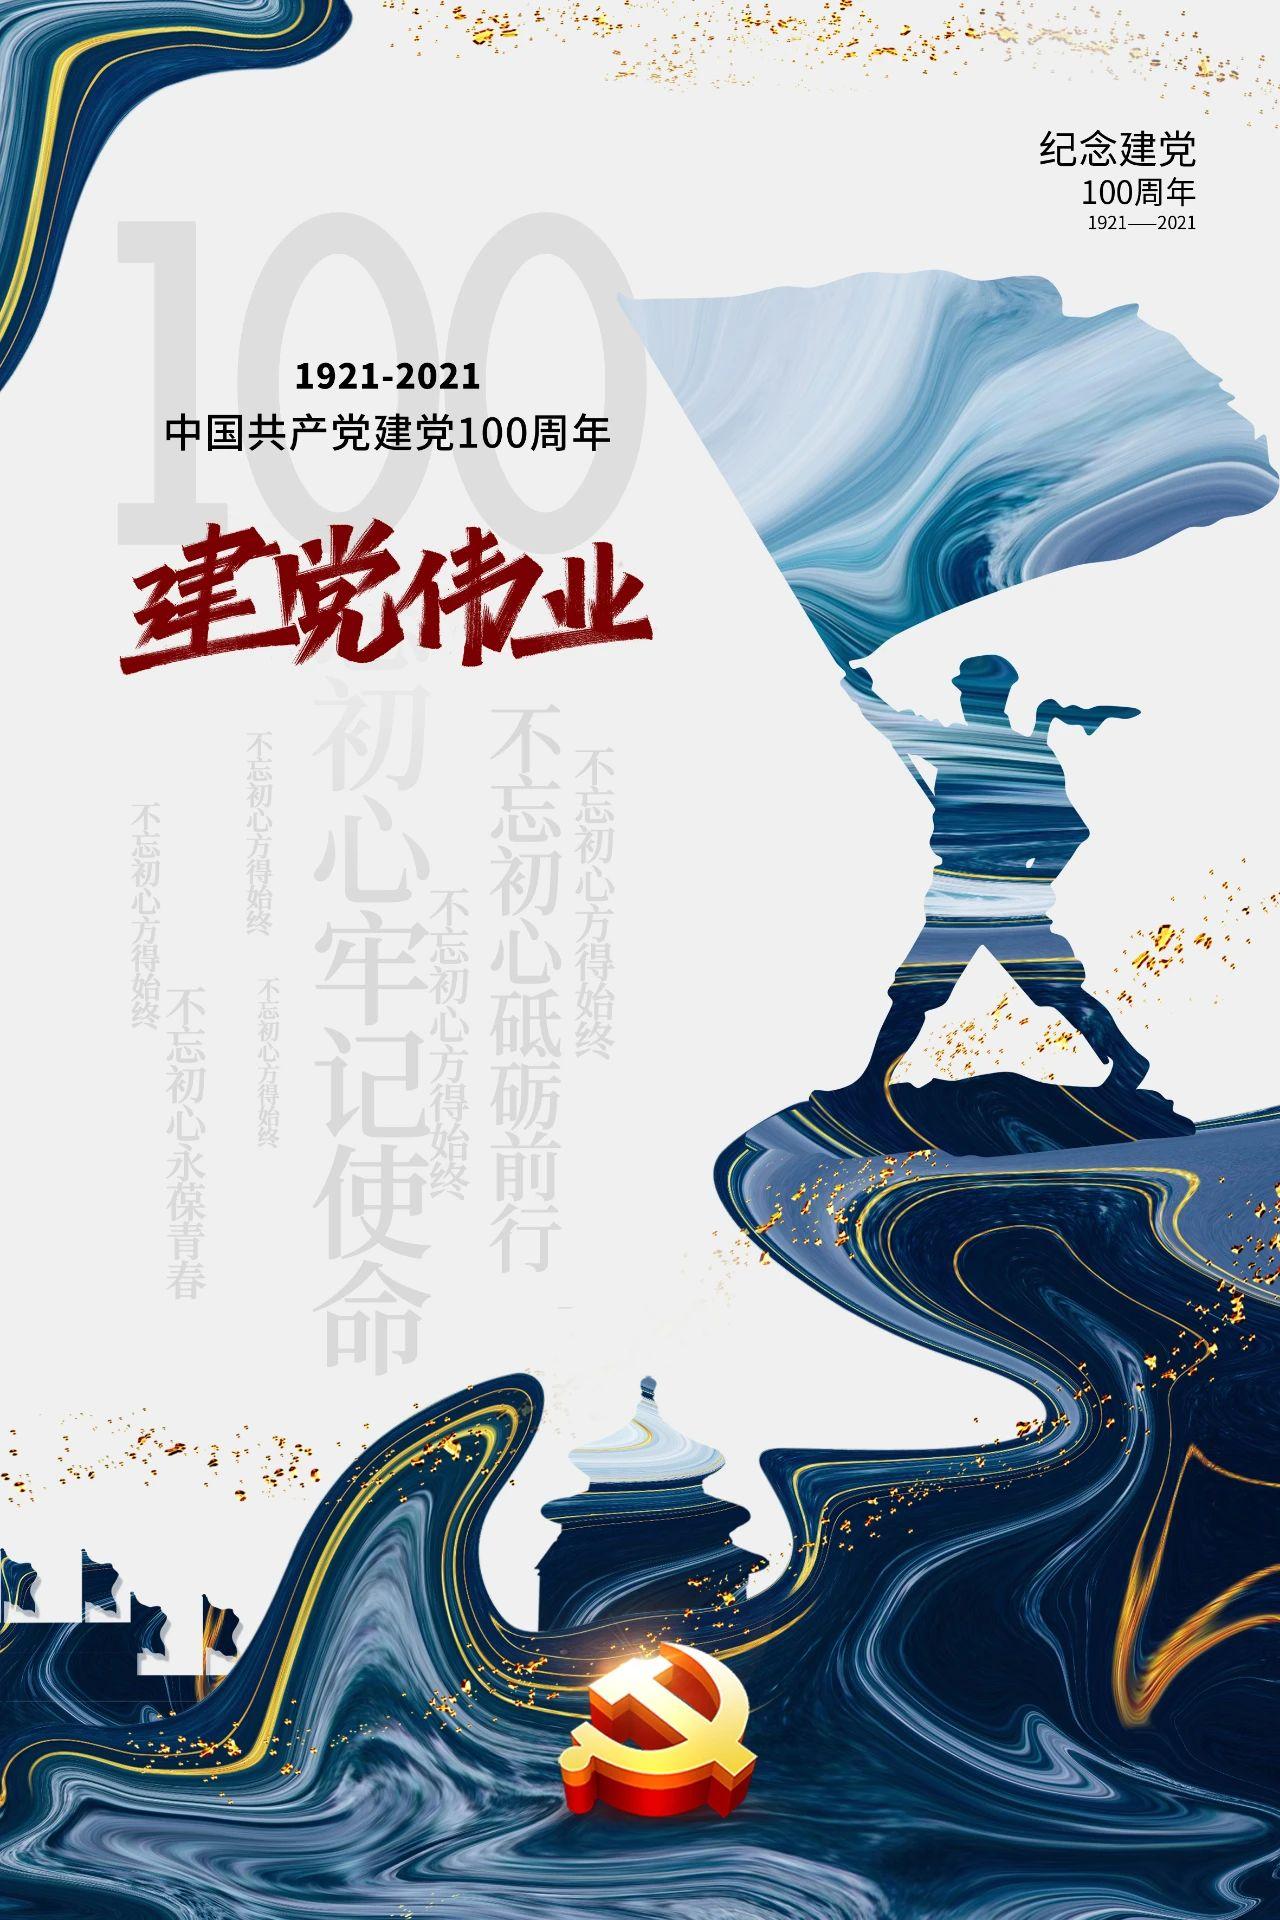 cl社区最新地址線纜恭賀中華人民共和國建黨100周年